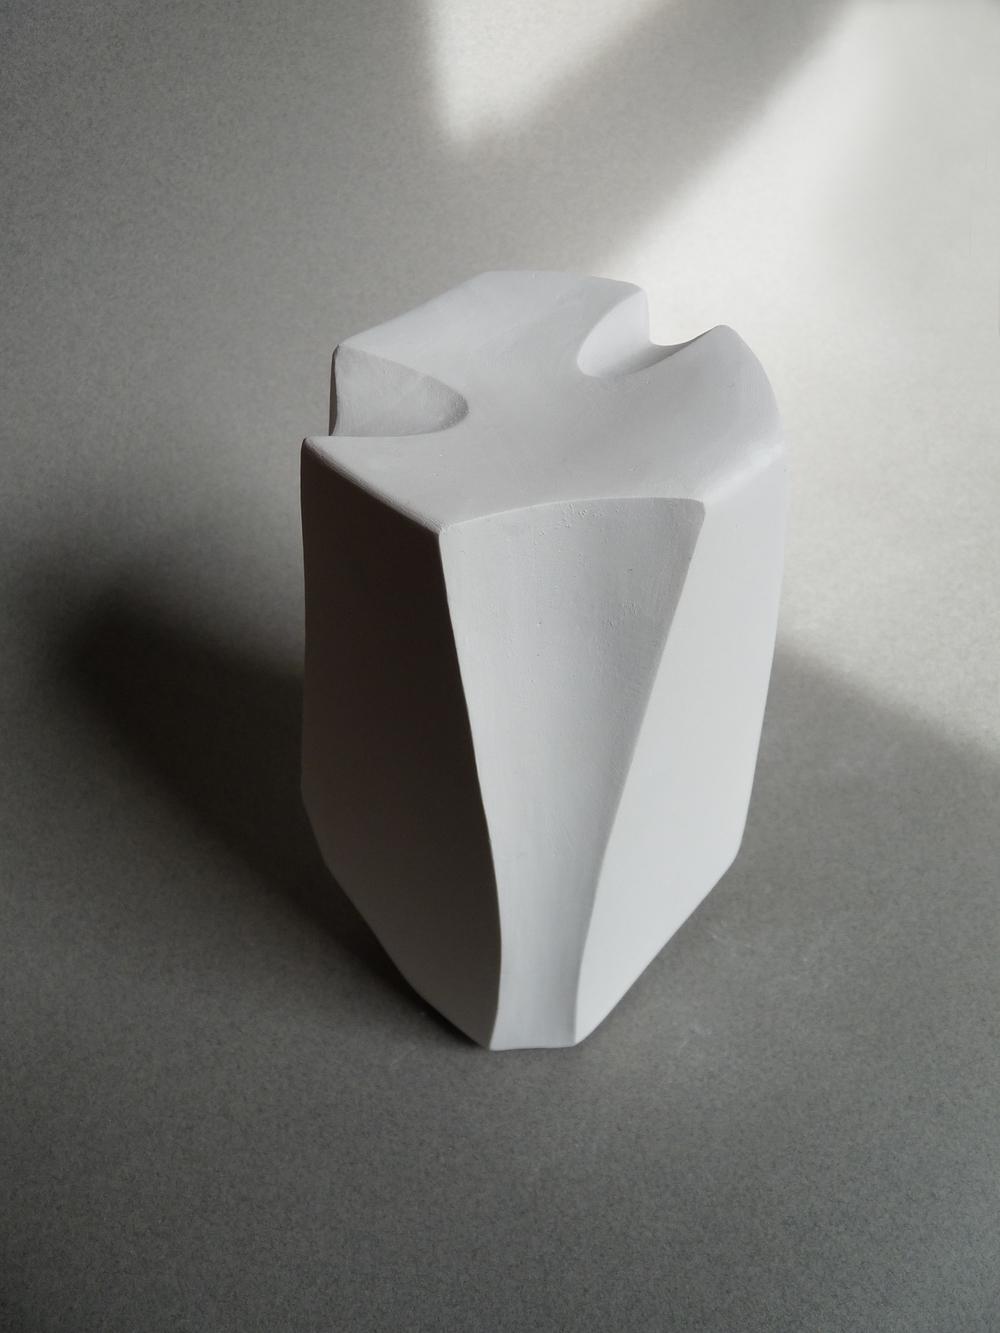 ecarlucci 1_angle.JPG